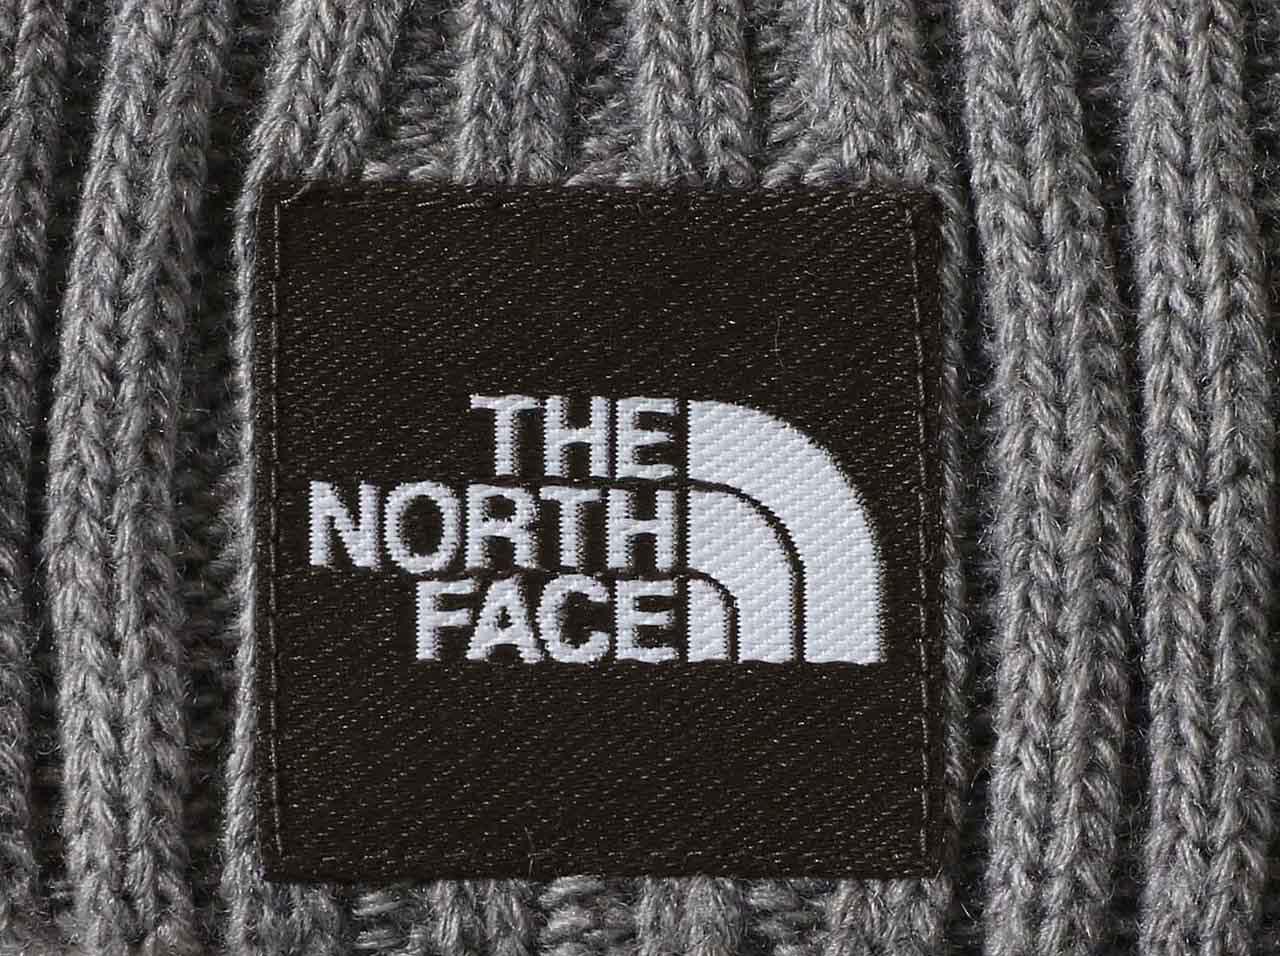 THE NORTH FACE Cappucho Lid - NN42035